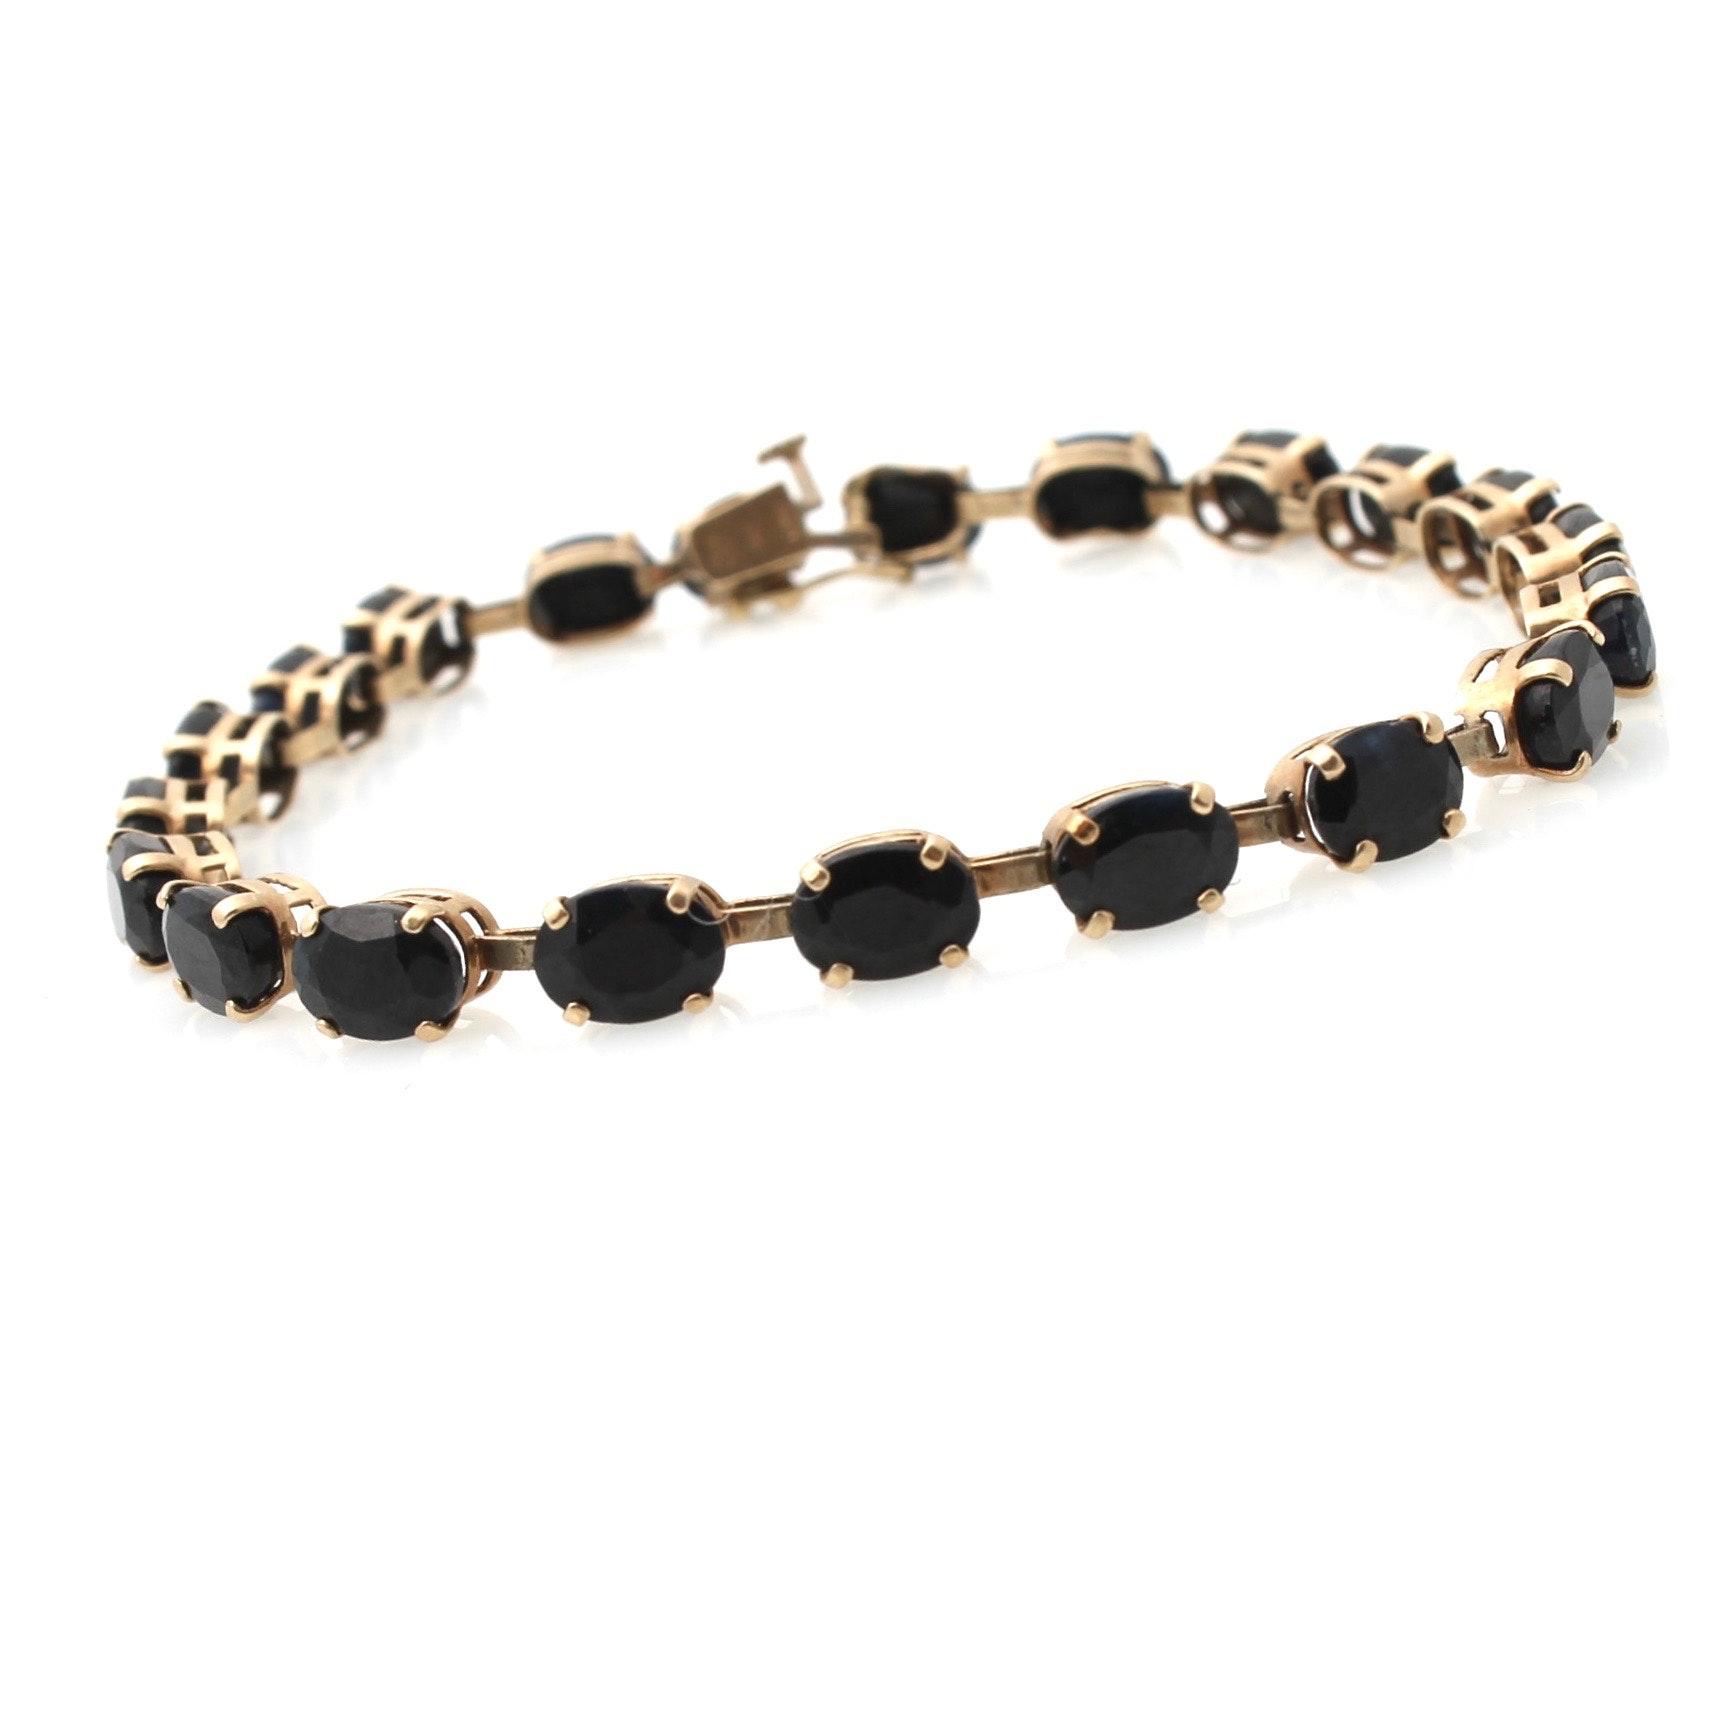 10K Yellow Gold Sapphire Tennis Bracelet